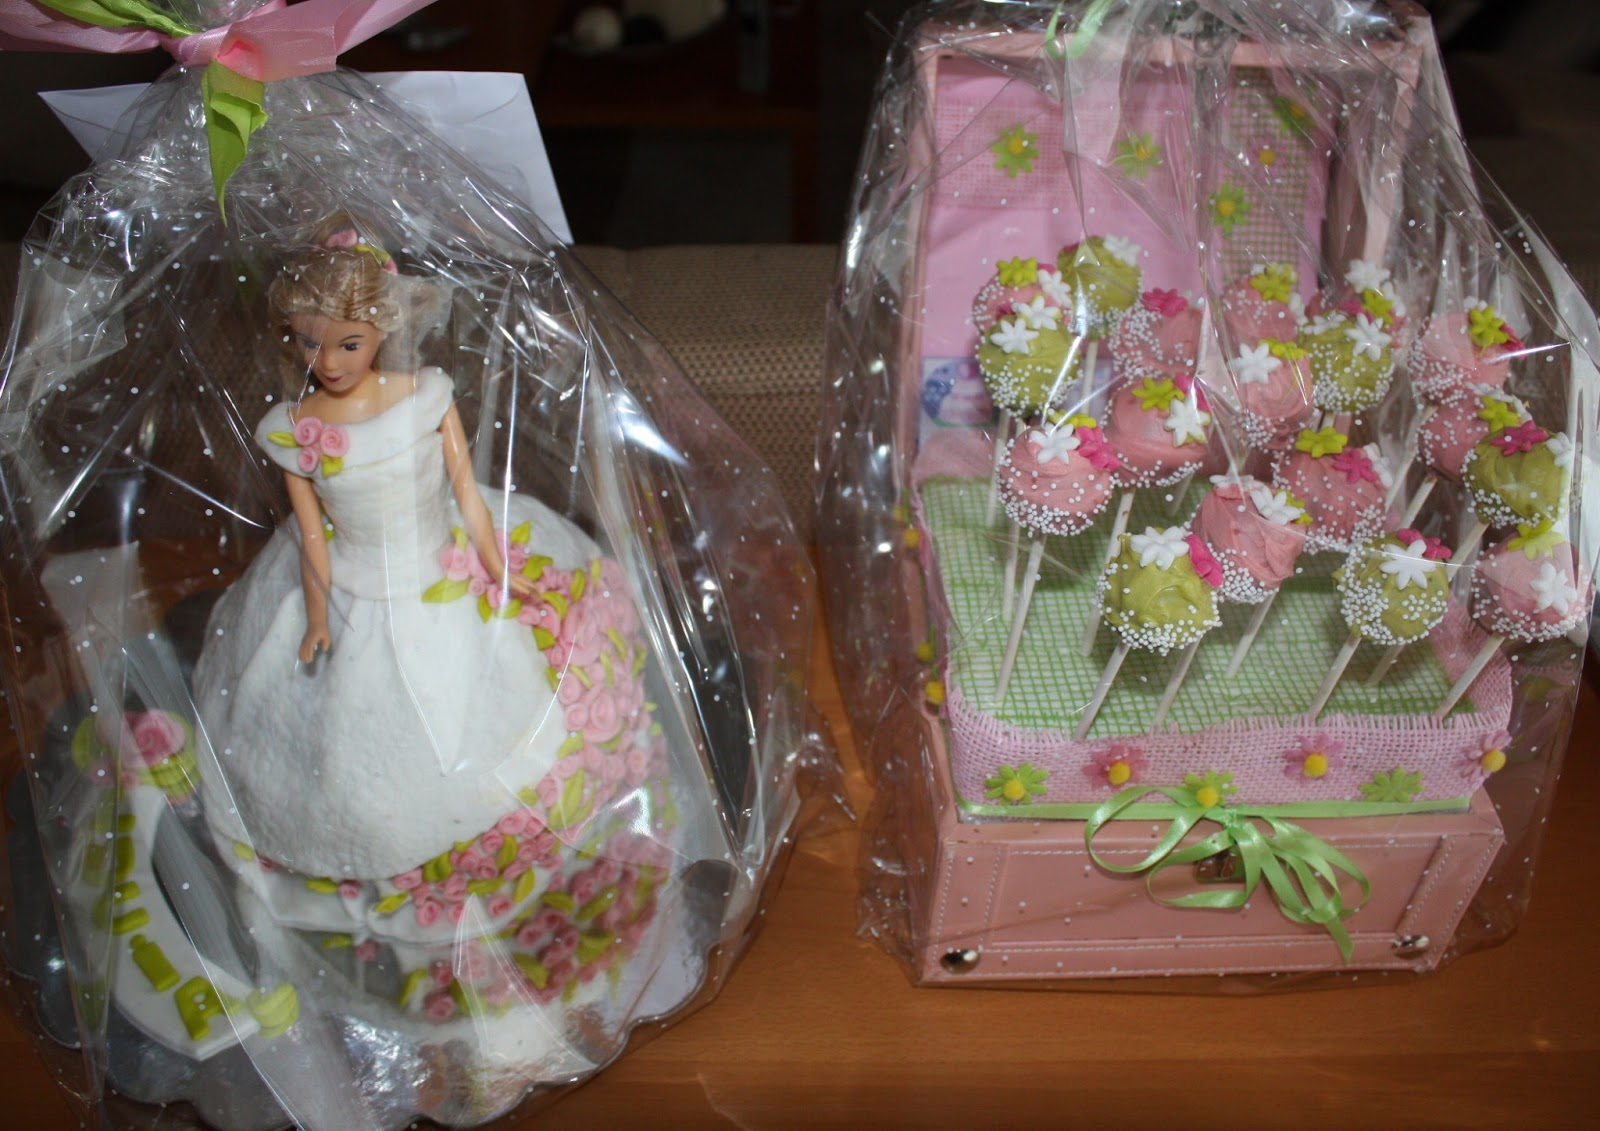 Blau cakes caja con cakepops un buen regalo - Un buen regalo para mi madre ...